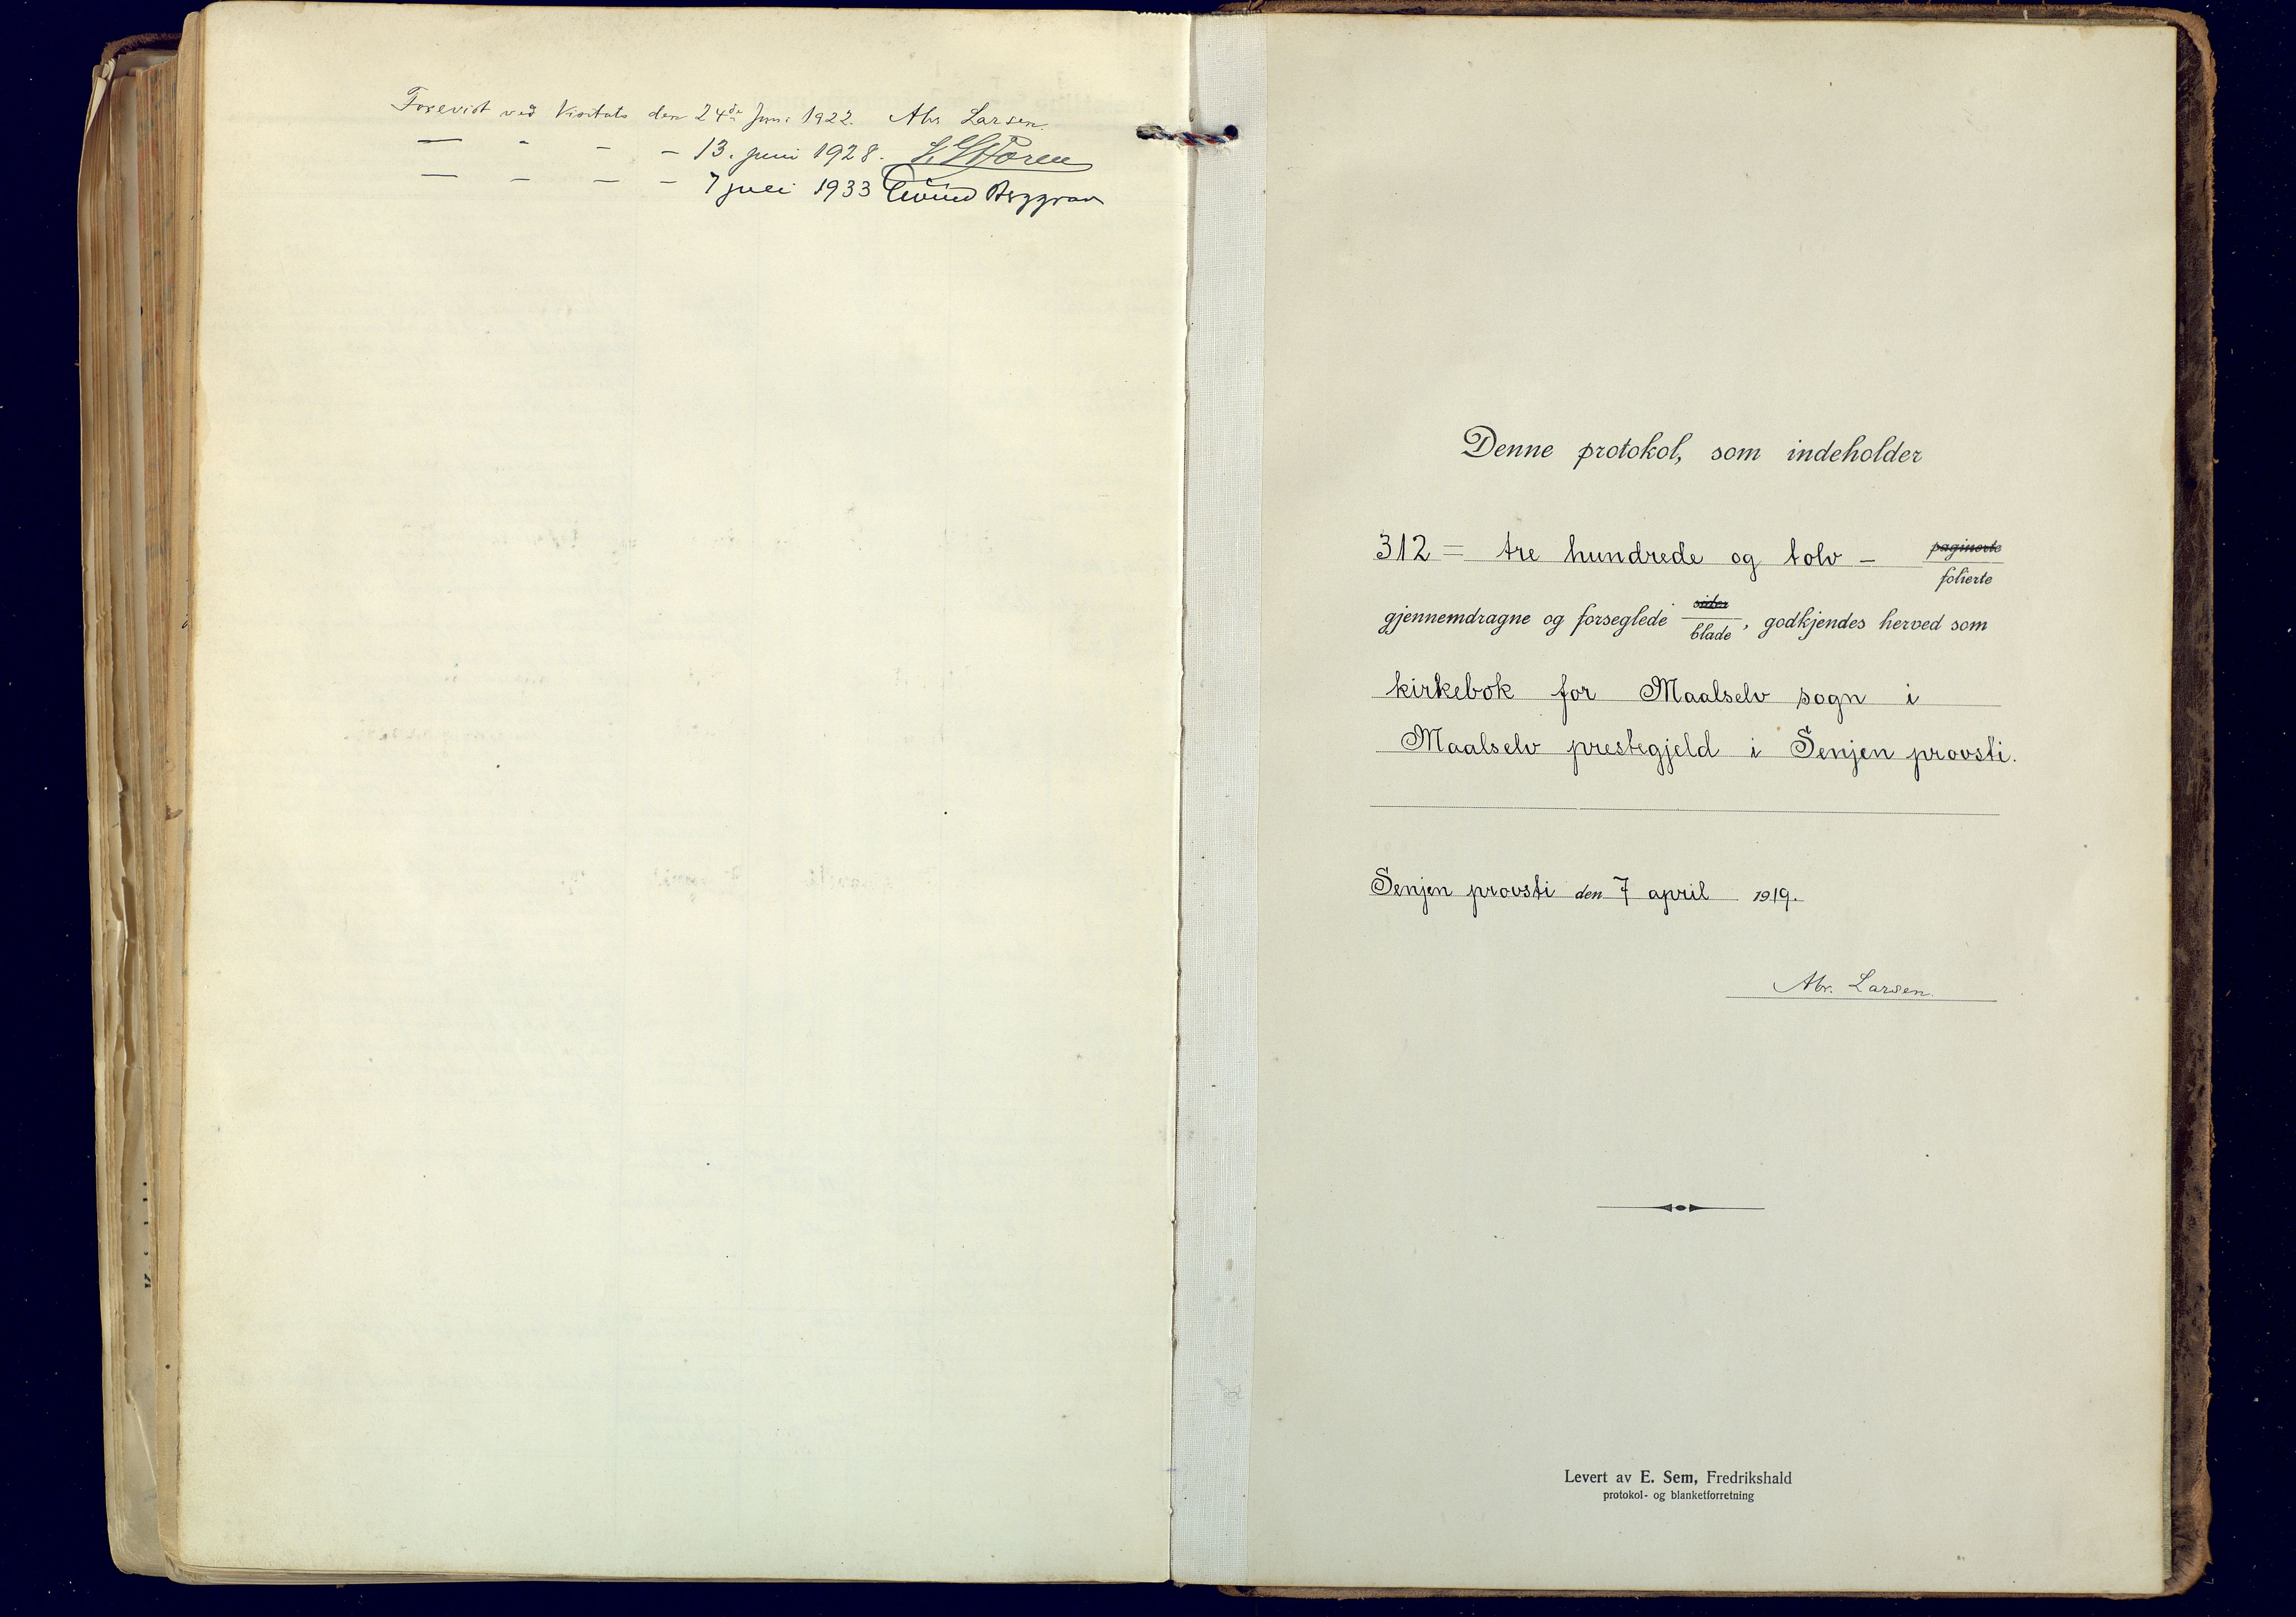 SATØ, Målselv sokneprestembete, Ministerialbok nr. 14, 1919-1932, s. 313